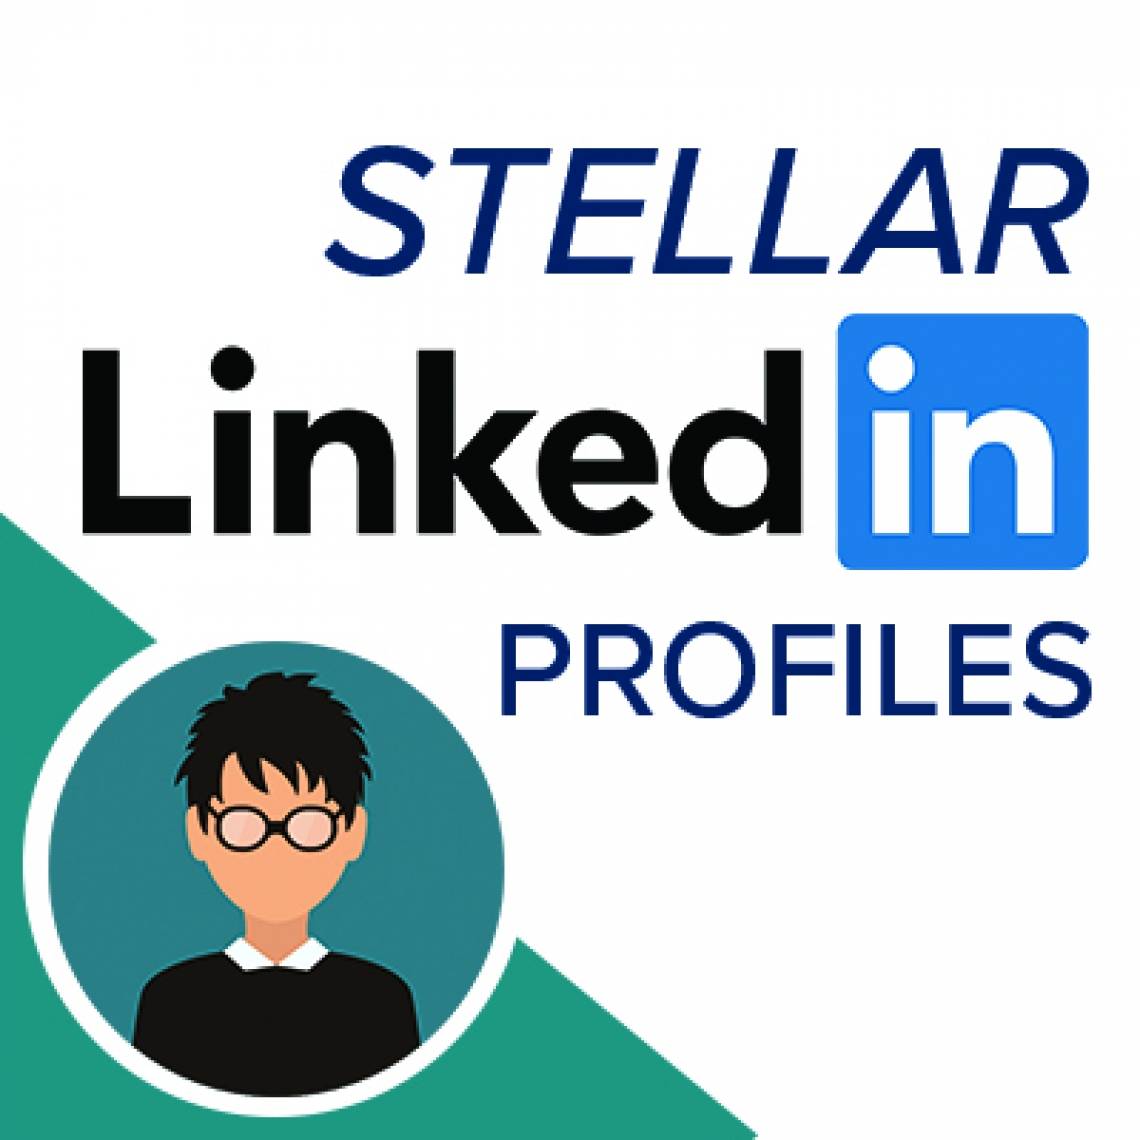 Stellar LinkedIn Profile